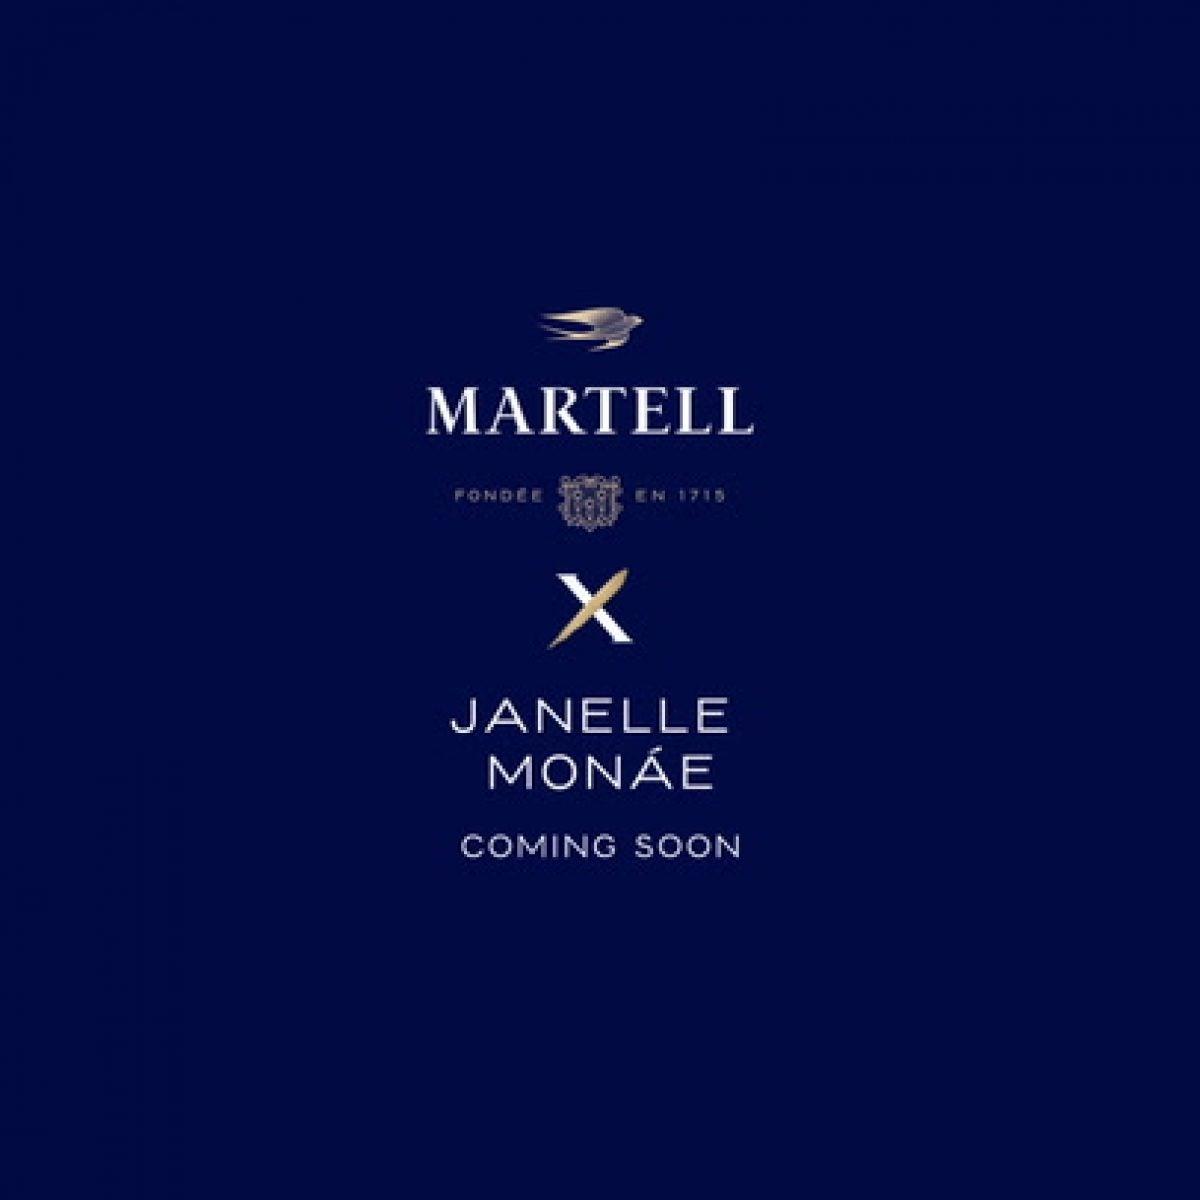 Martell Blue Swift Sizzle  Janelle Monàe